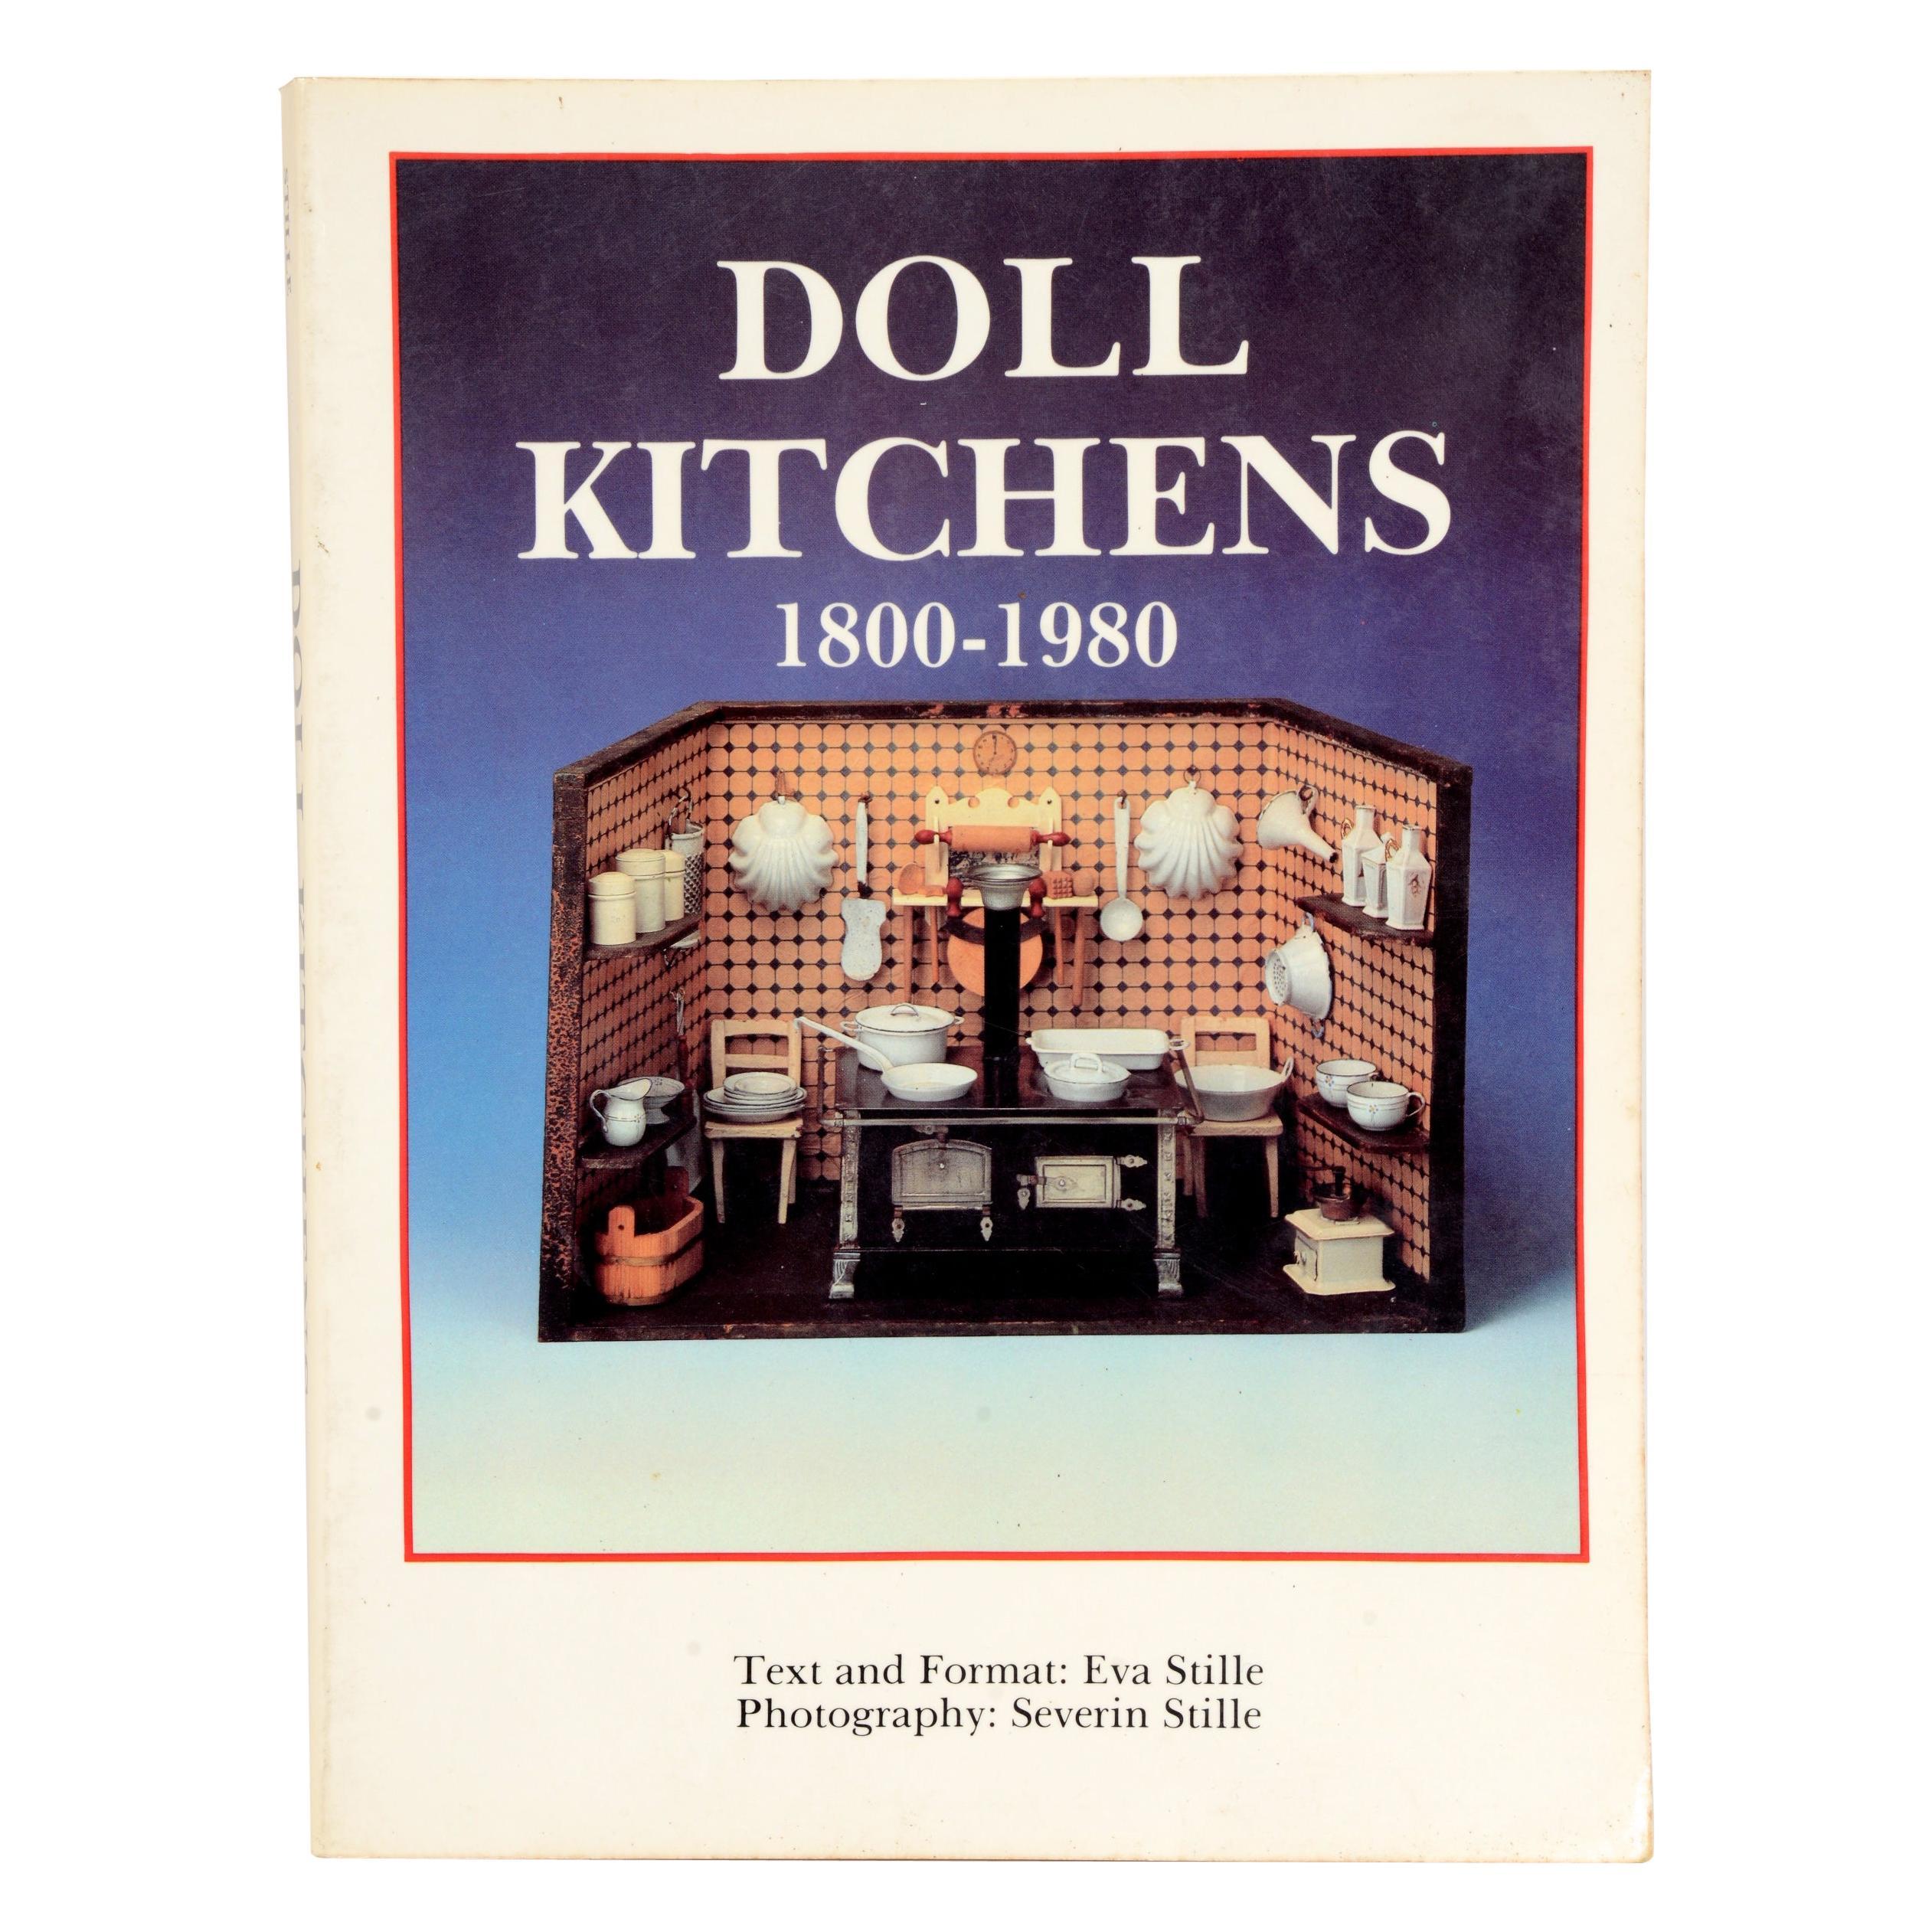 Doll Kitchens, 1800-1980 by Eva Stille, First Edition